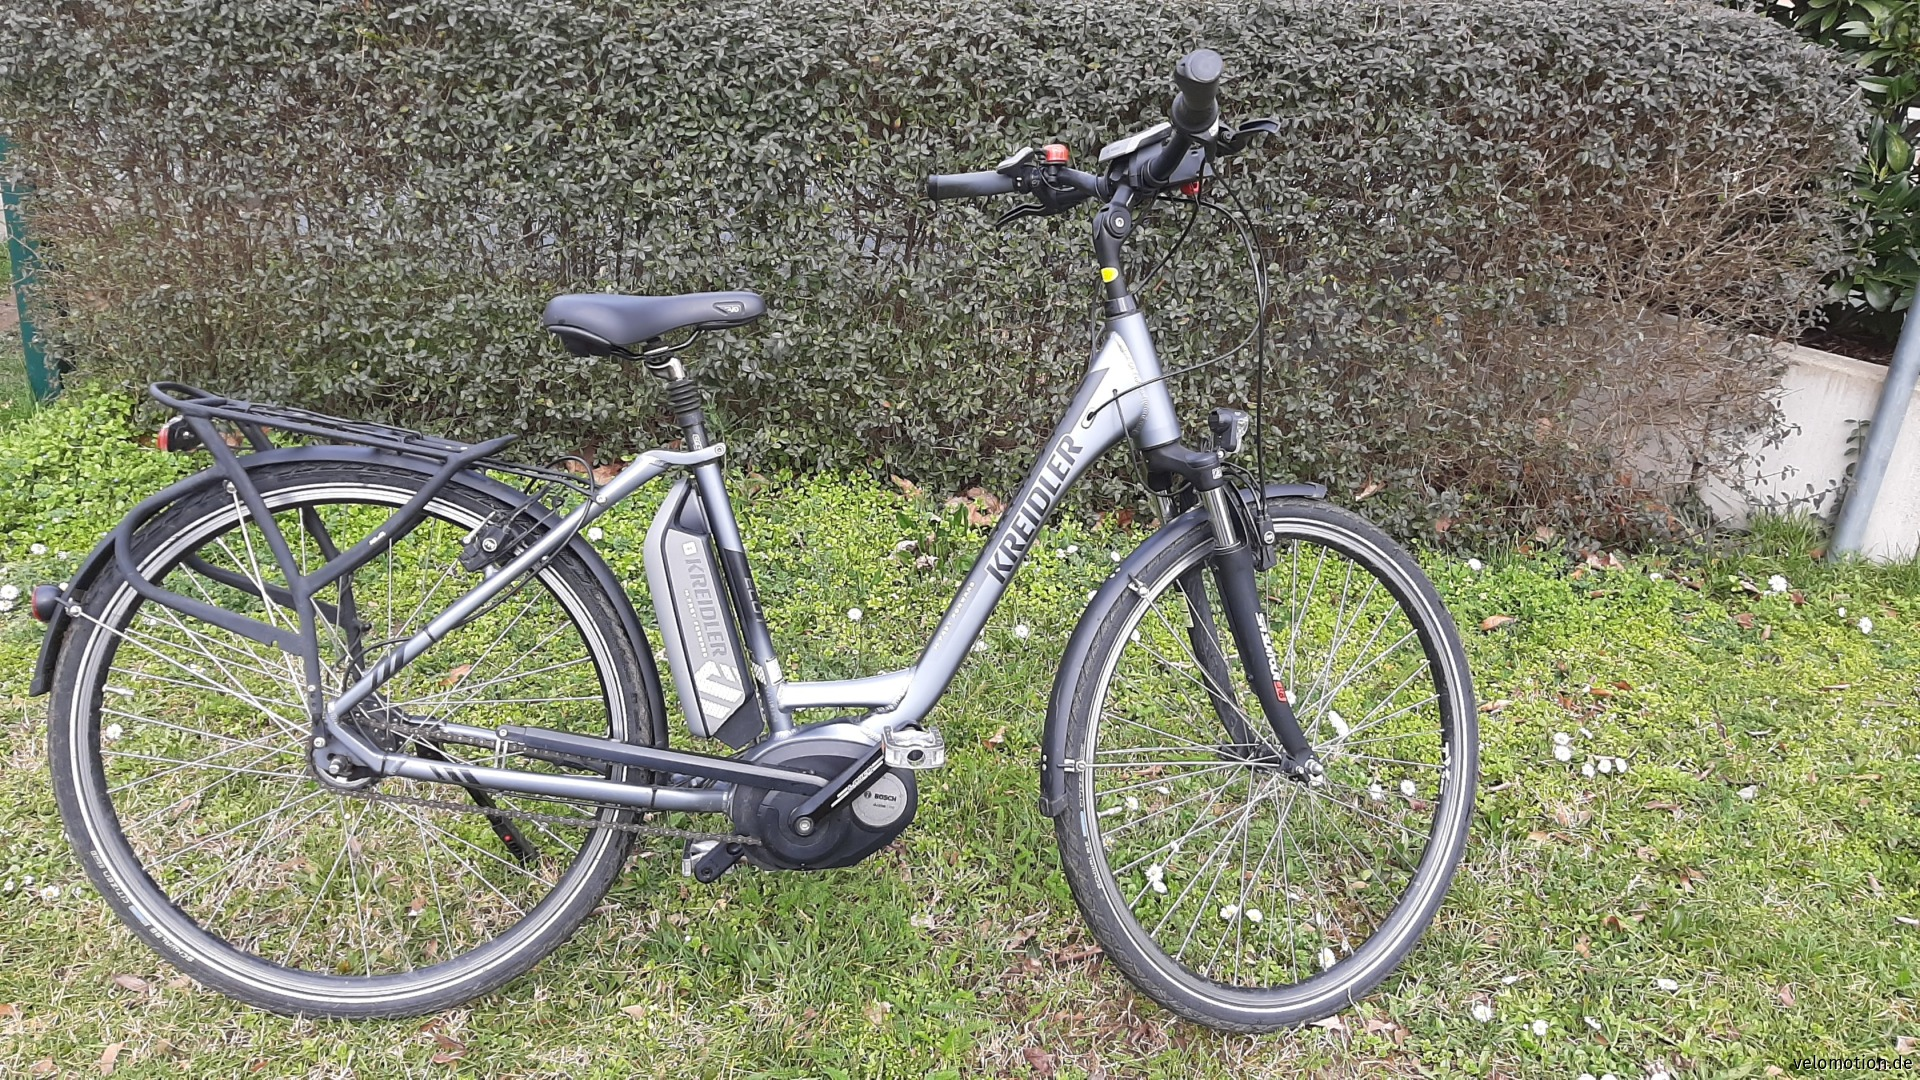 E-Bike Kreidler Vitality Eco 1 mit Bosch-Motor  #1